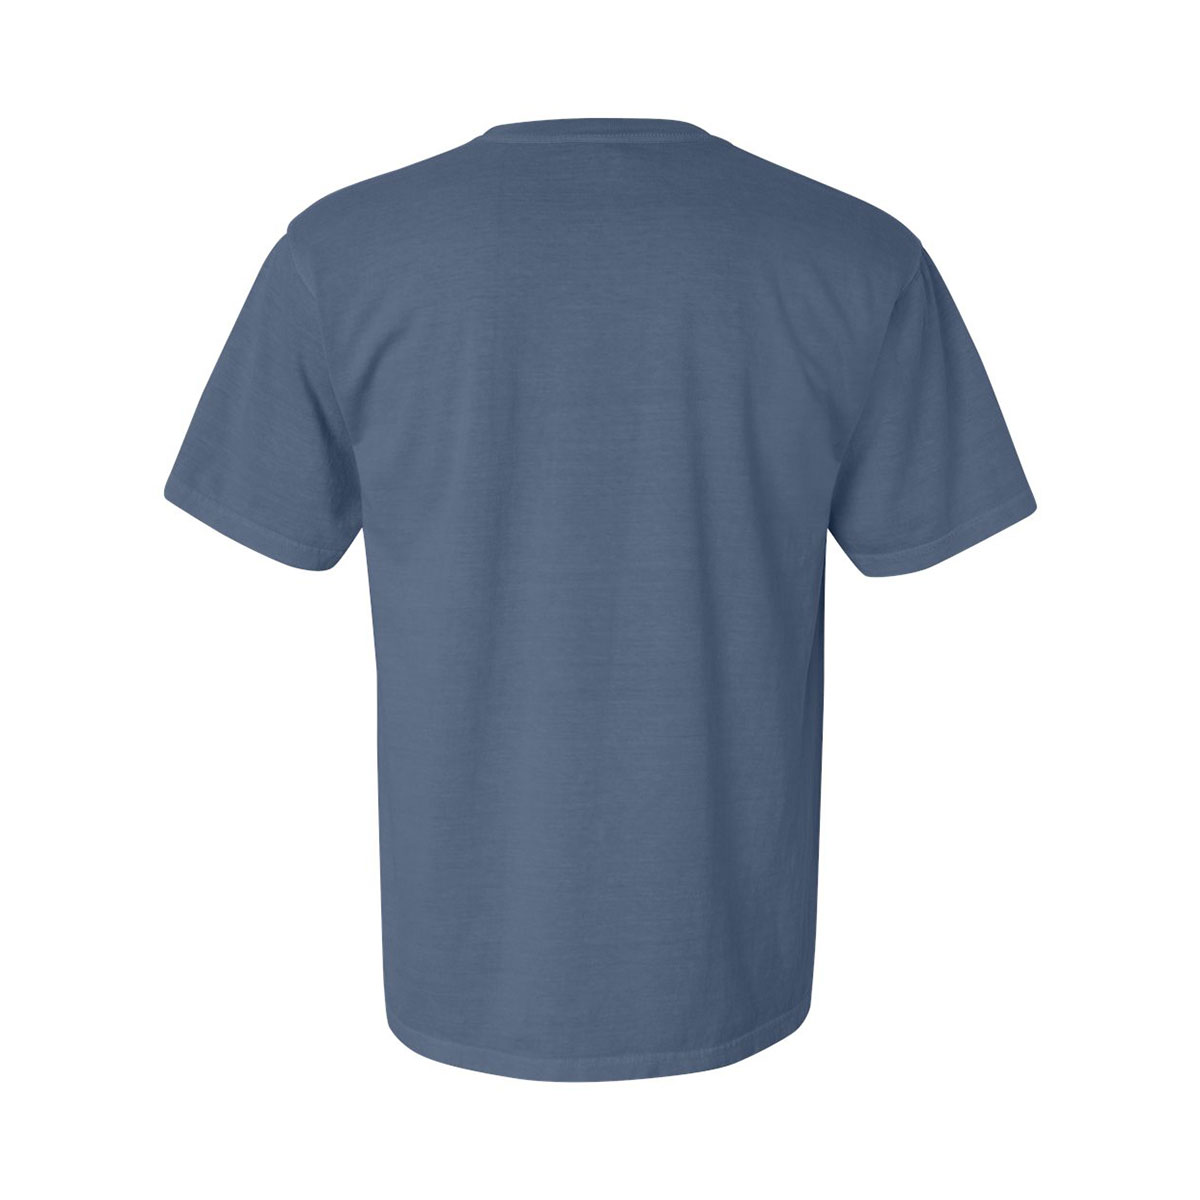 comfort-colors-shirts-blue-jean-back